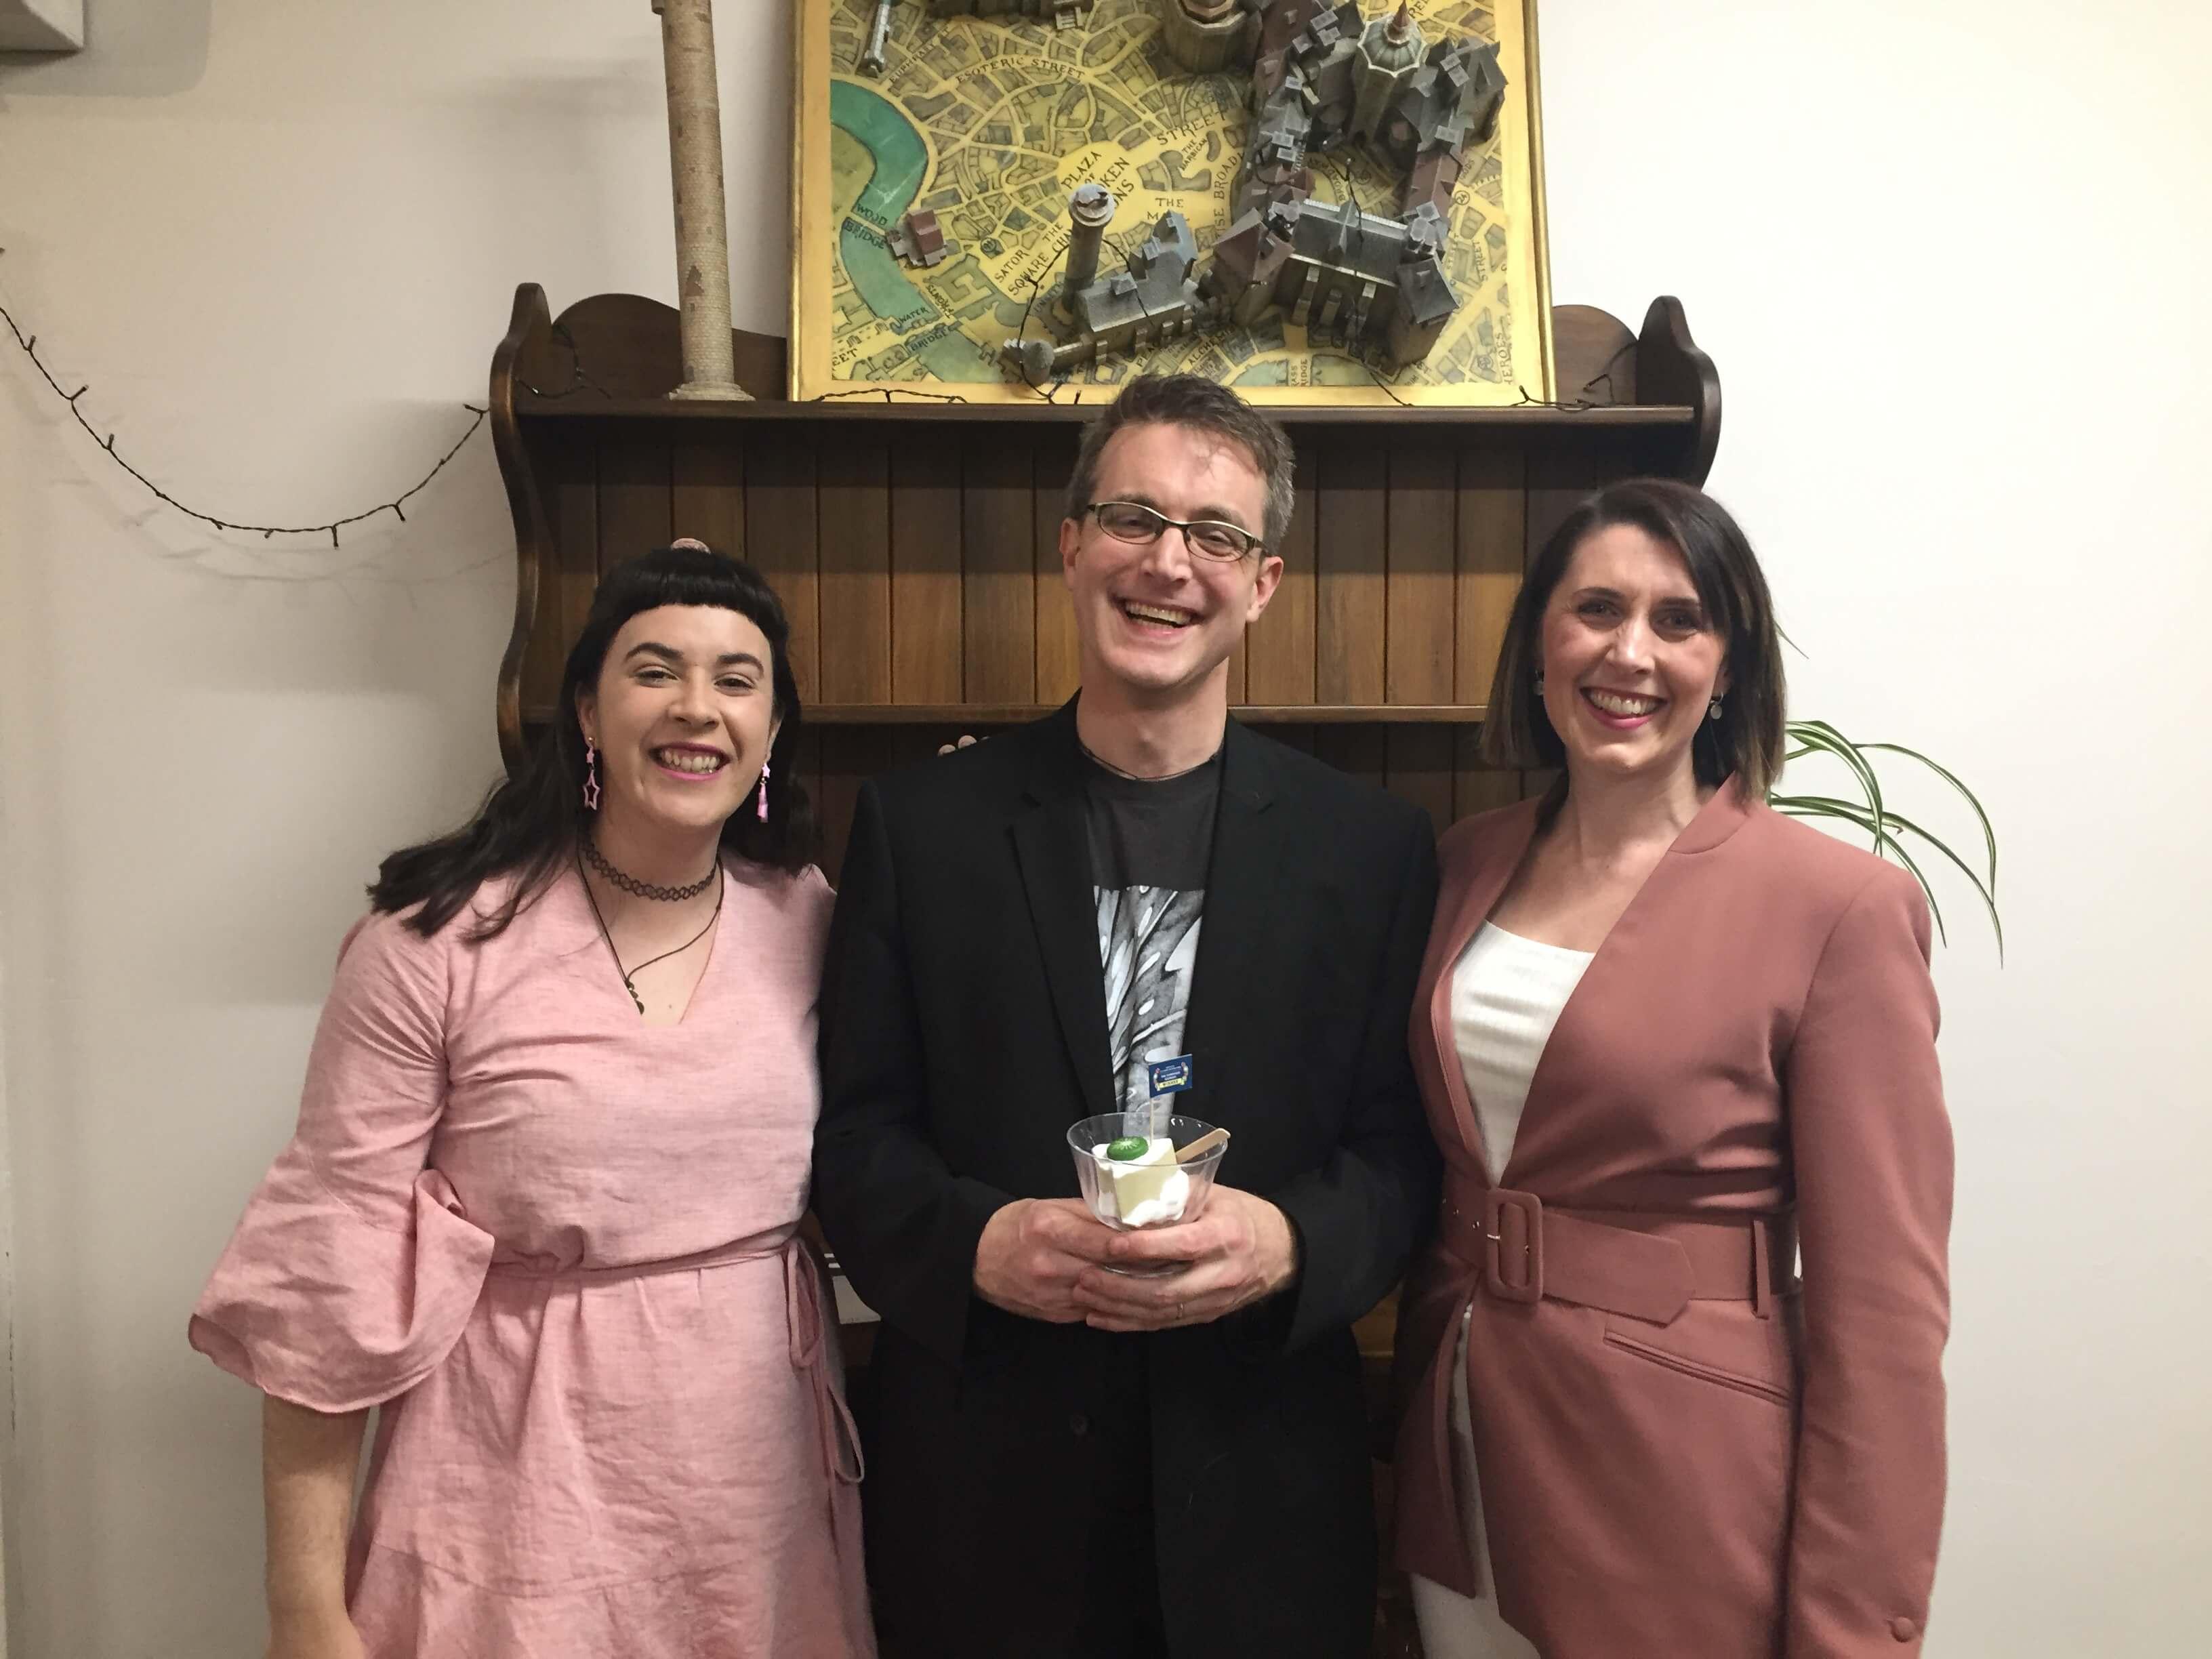 Sam Barham from Balancing Monkey Games, with Lisa Blakie and Zoe Hobson from Runaway Play, Dunedin's three Pav winners